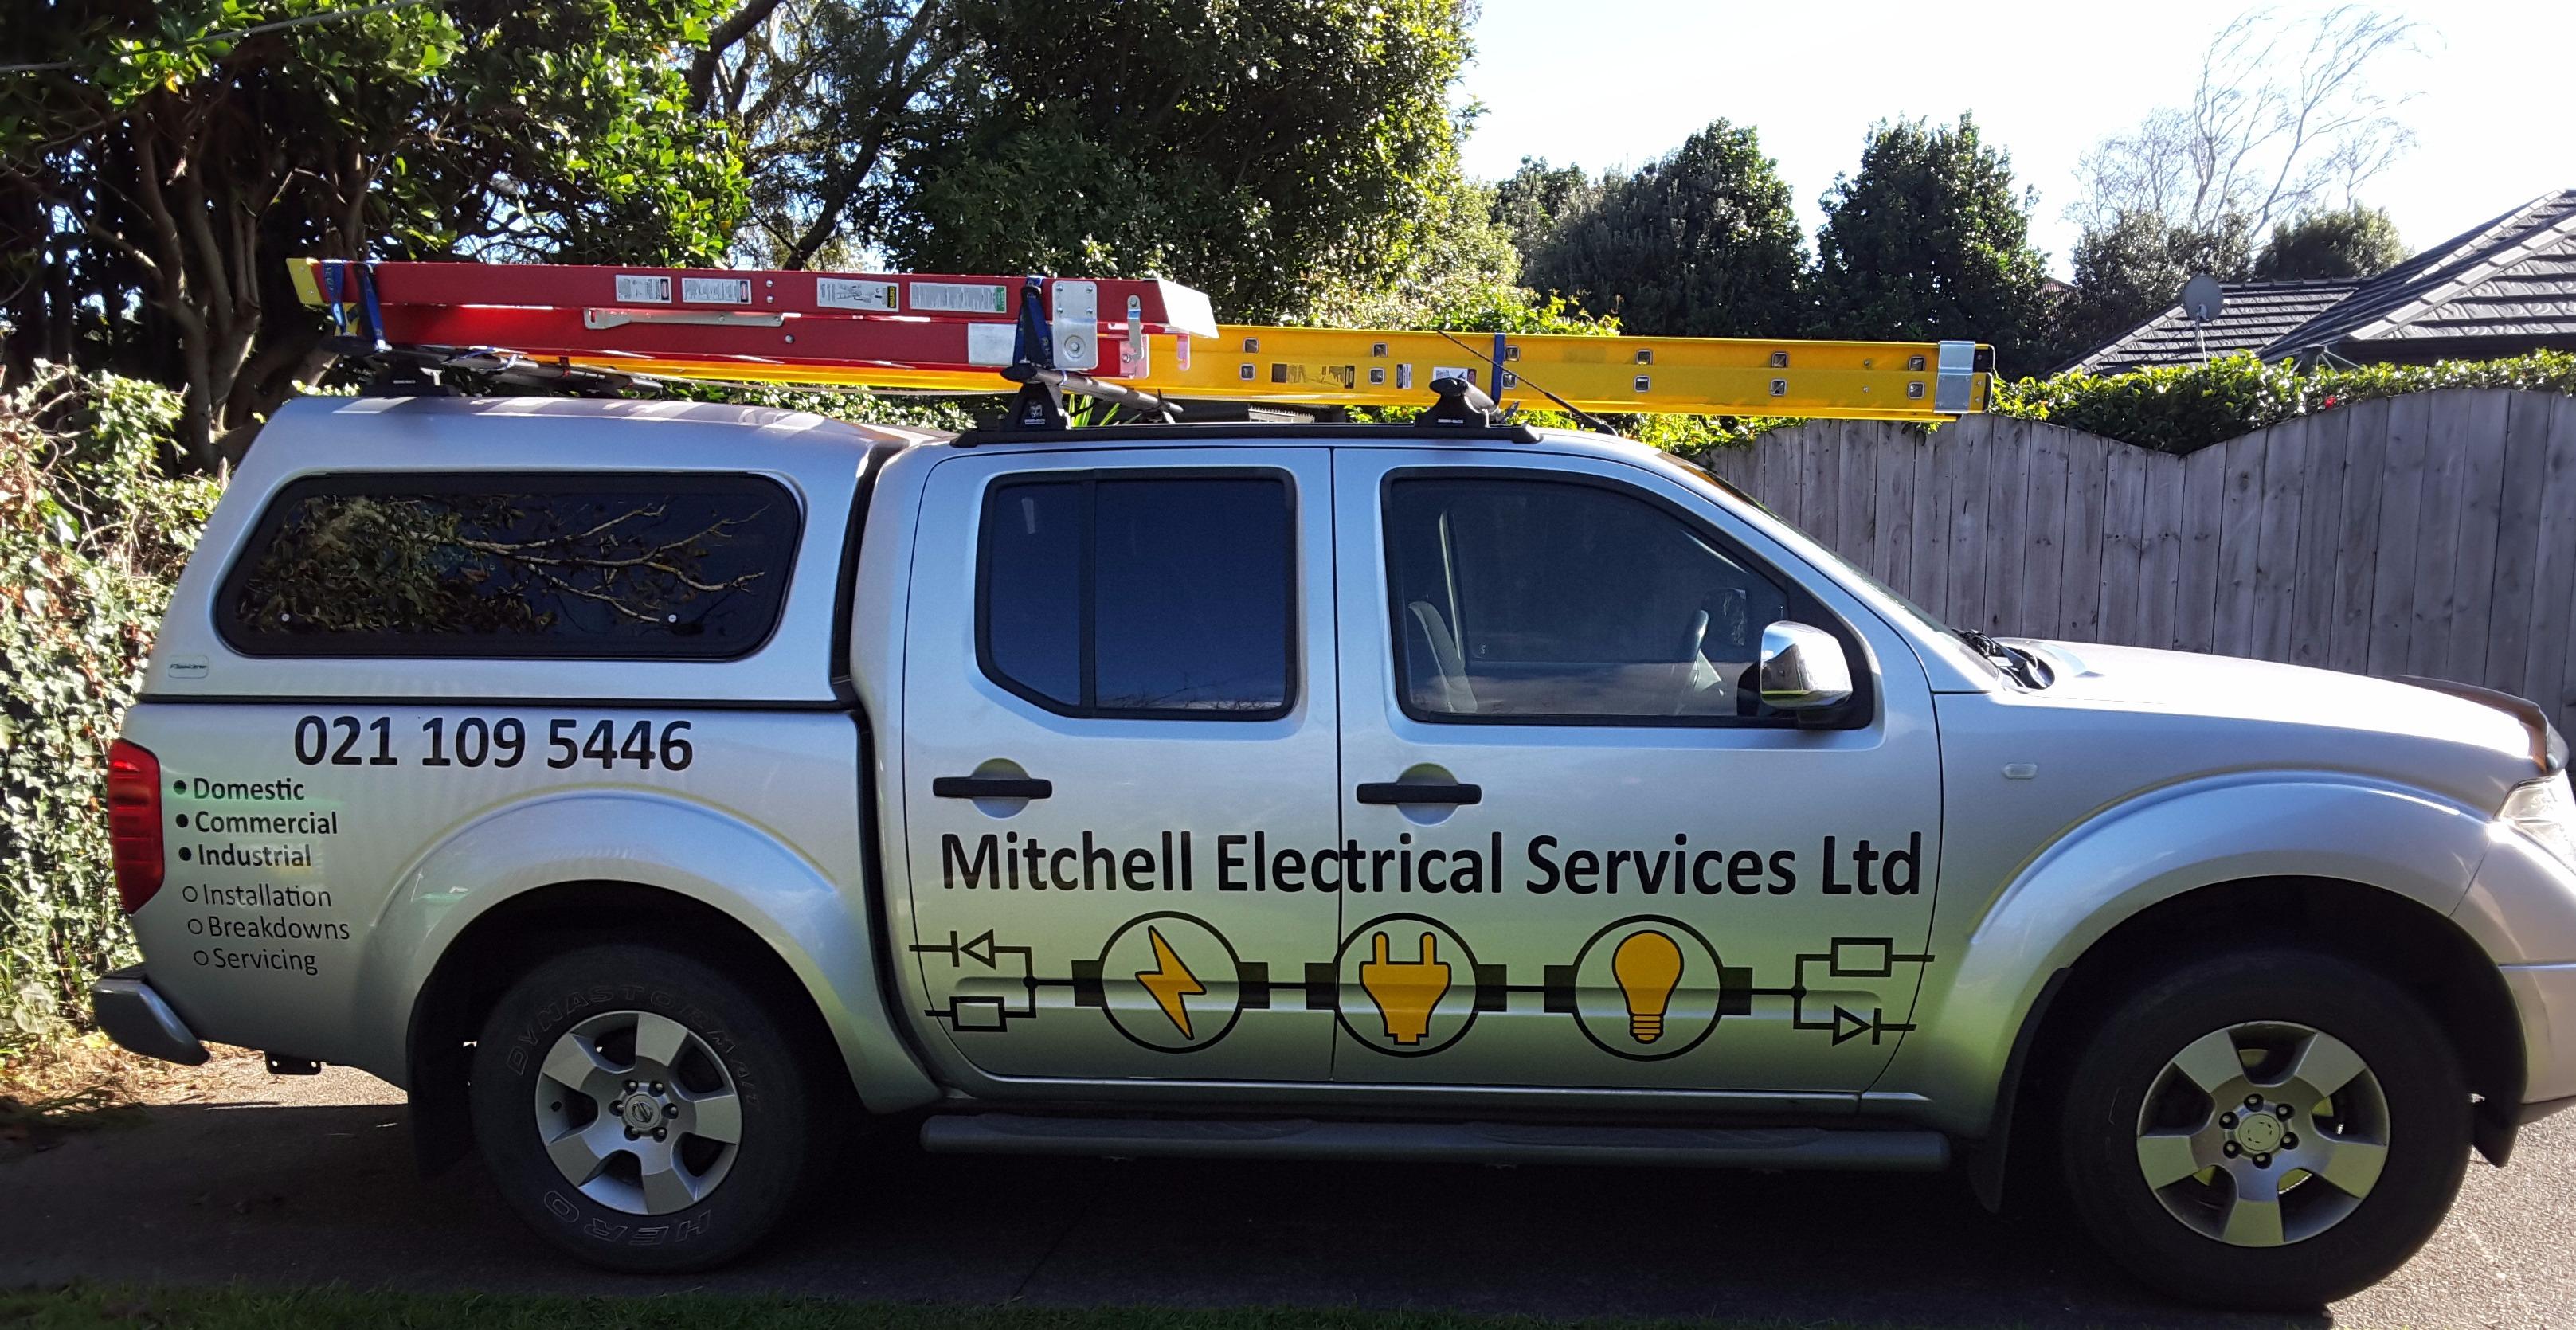 Mitchell Electrical Services Waiuku Yellow Nz Wiring A Light Socket New Zealand Business Image